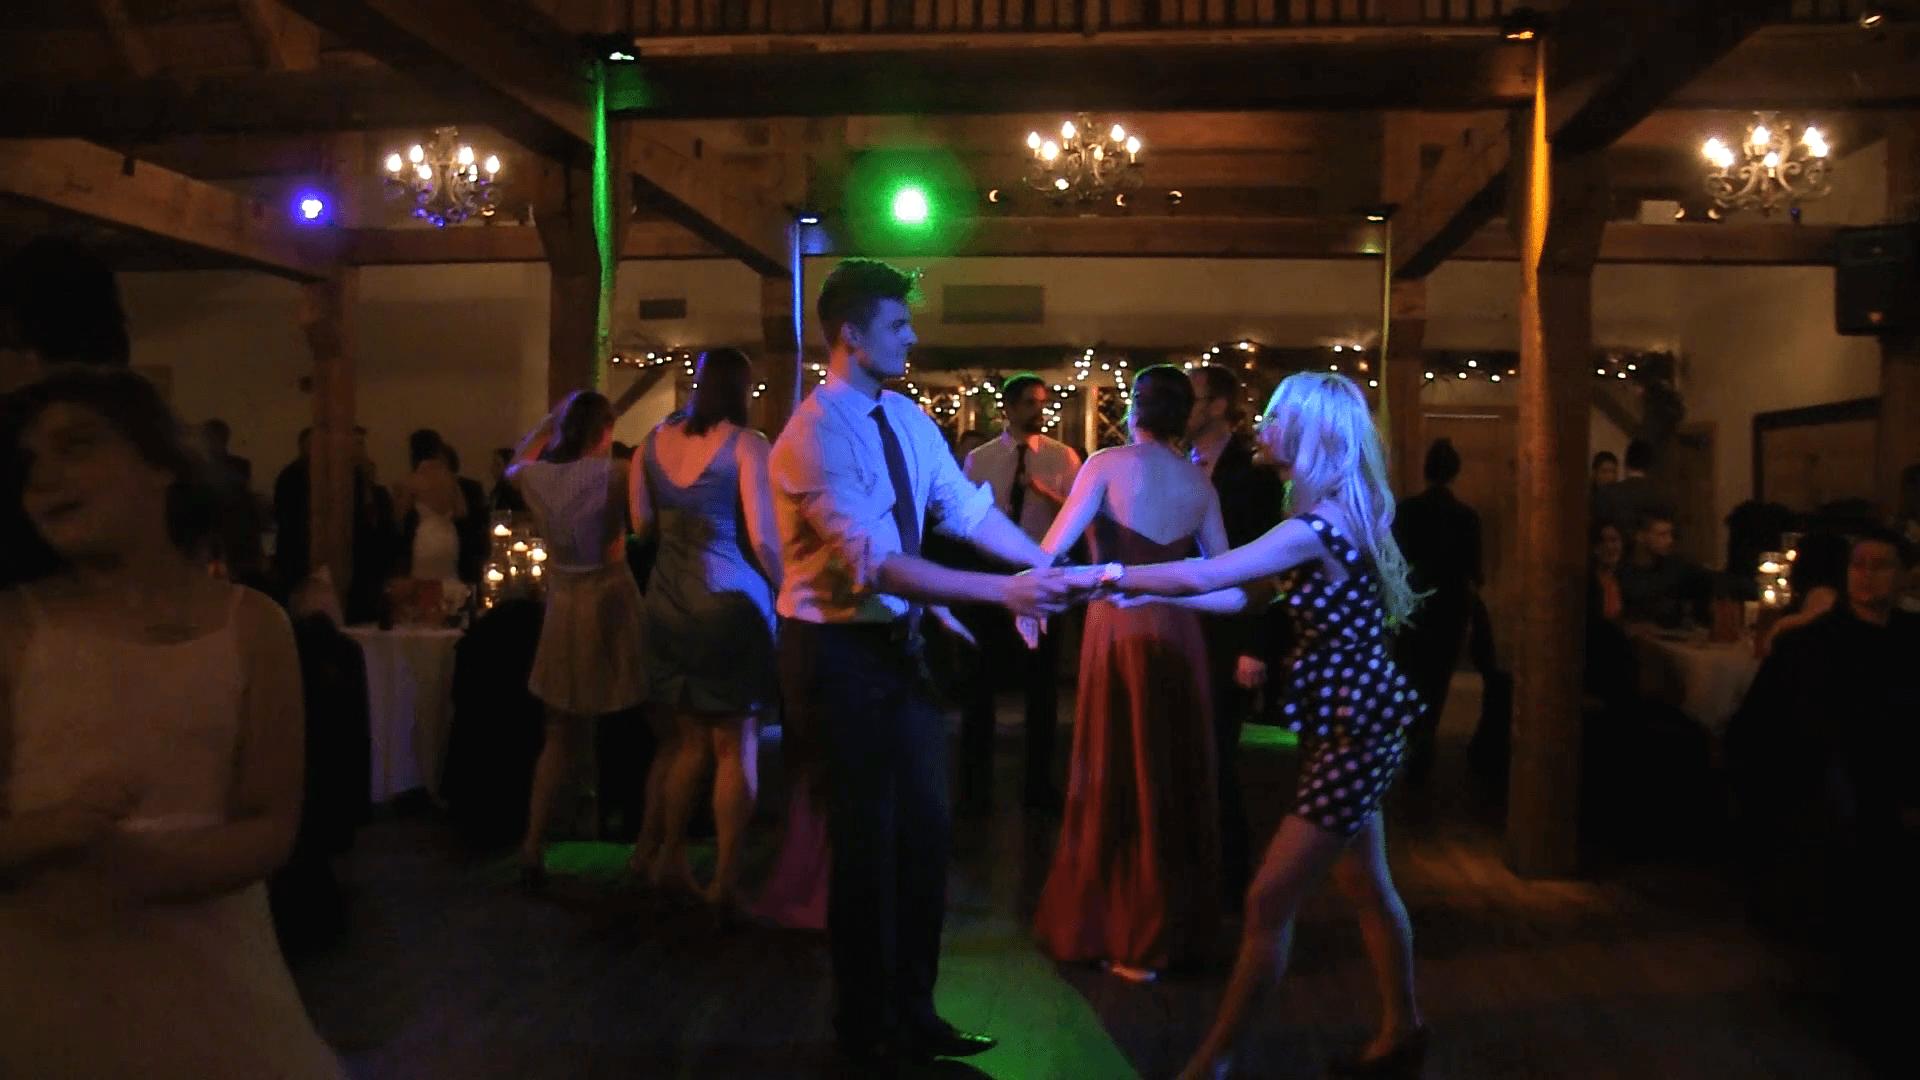 Couple-Dancing-Green